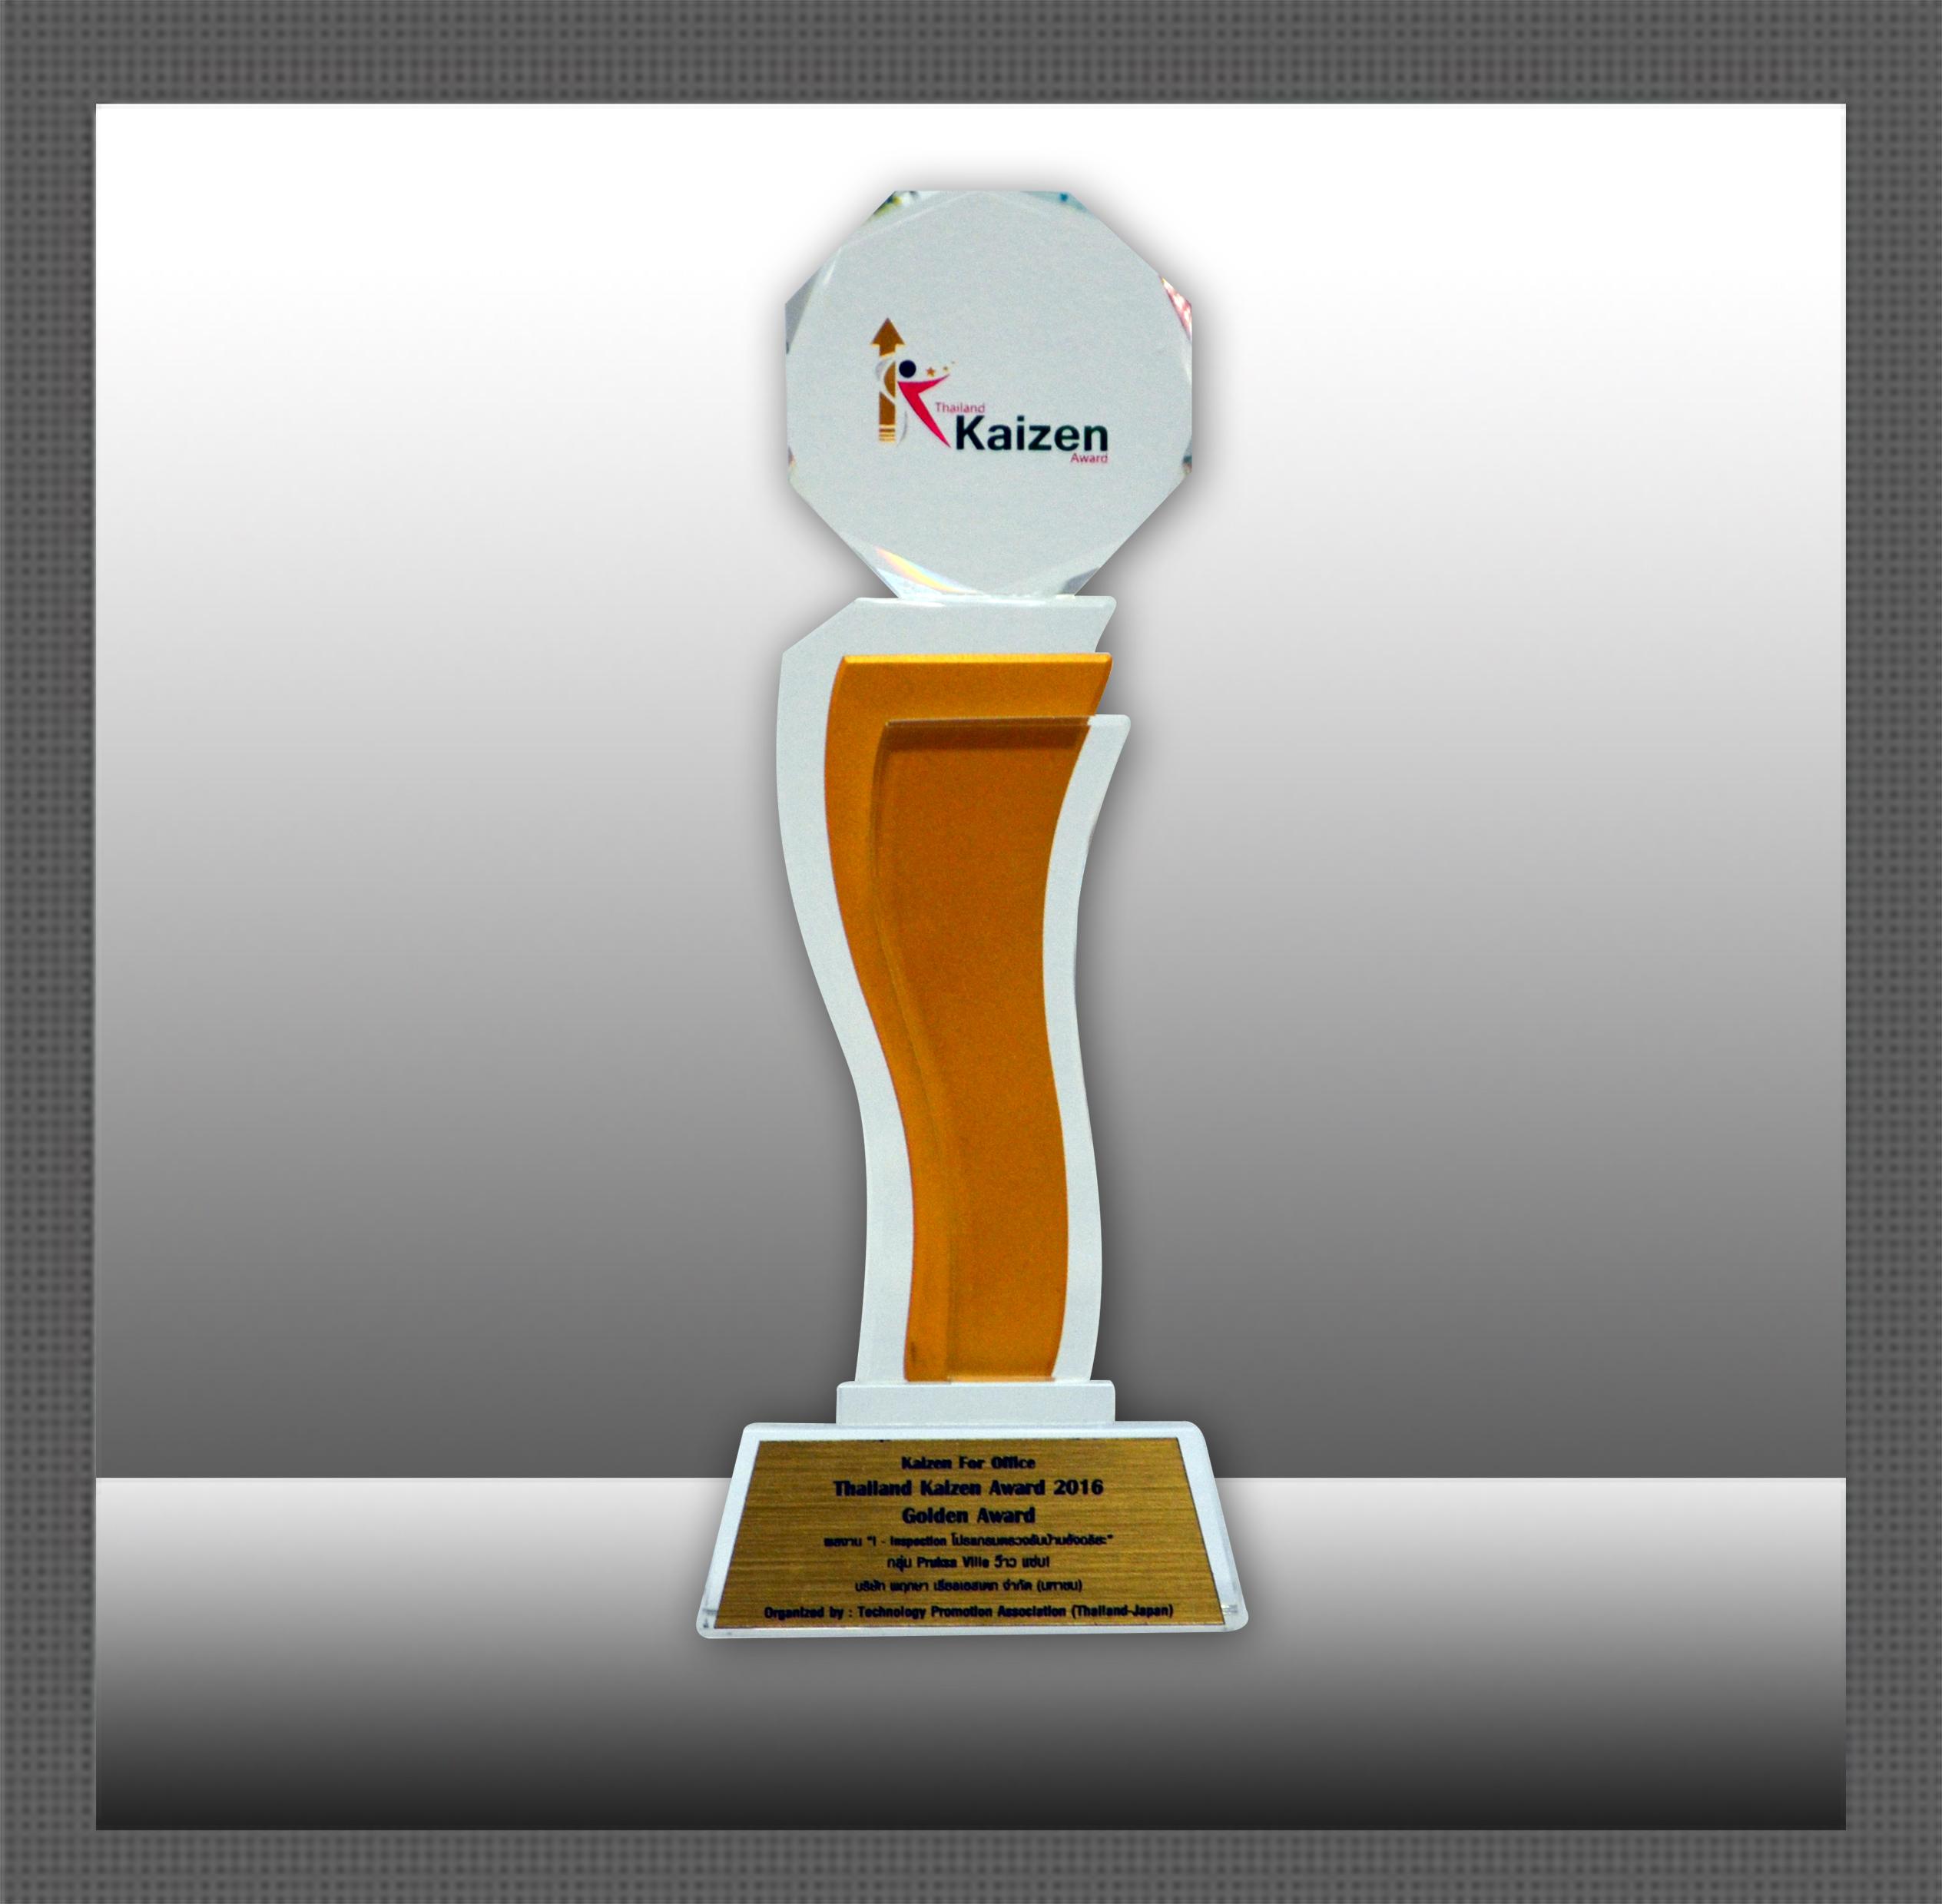 Thailand Kaizen Award 2016